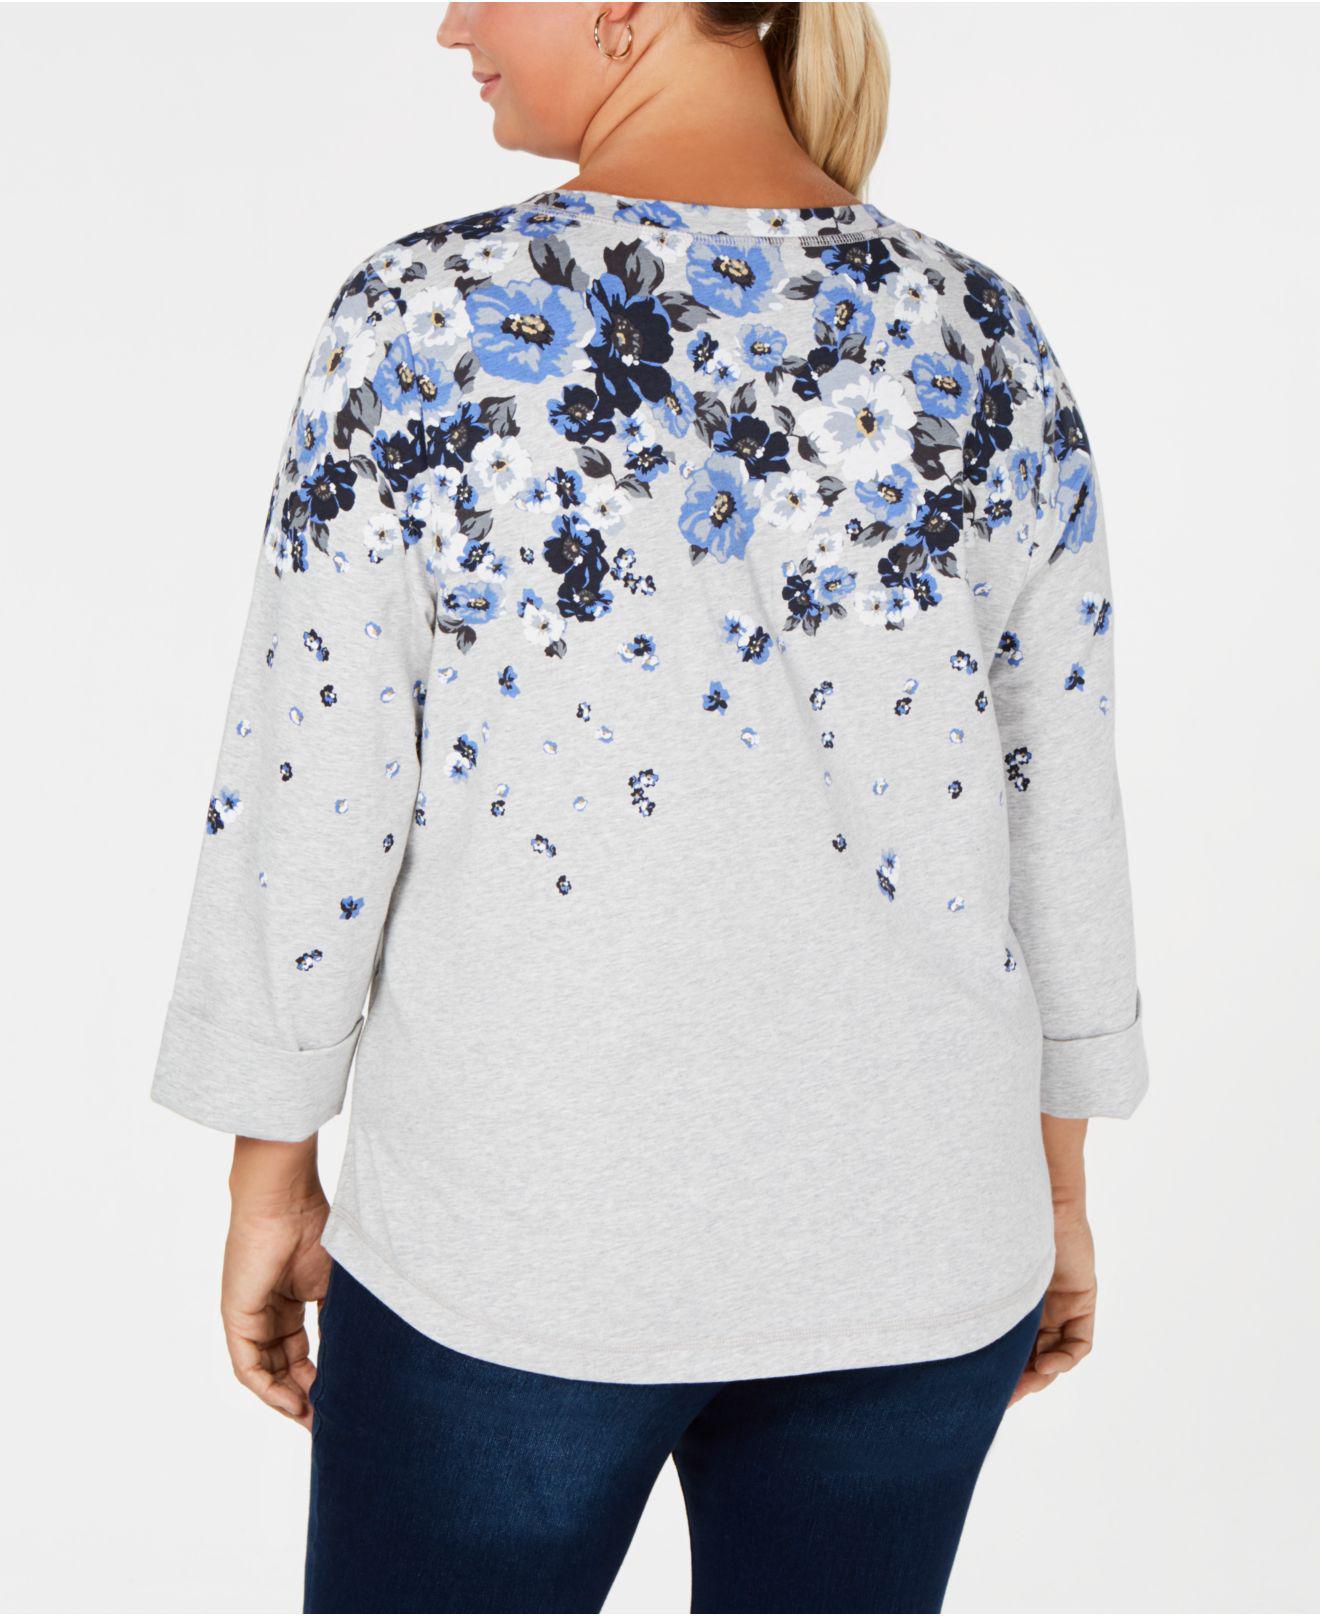 a3e85f47fd4 Lyst - Karen Scott Plus Size Floral-print Top